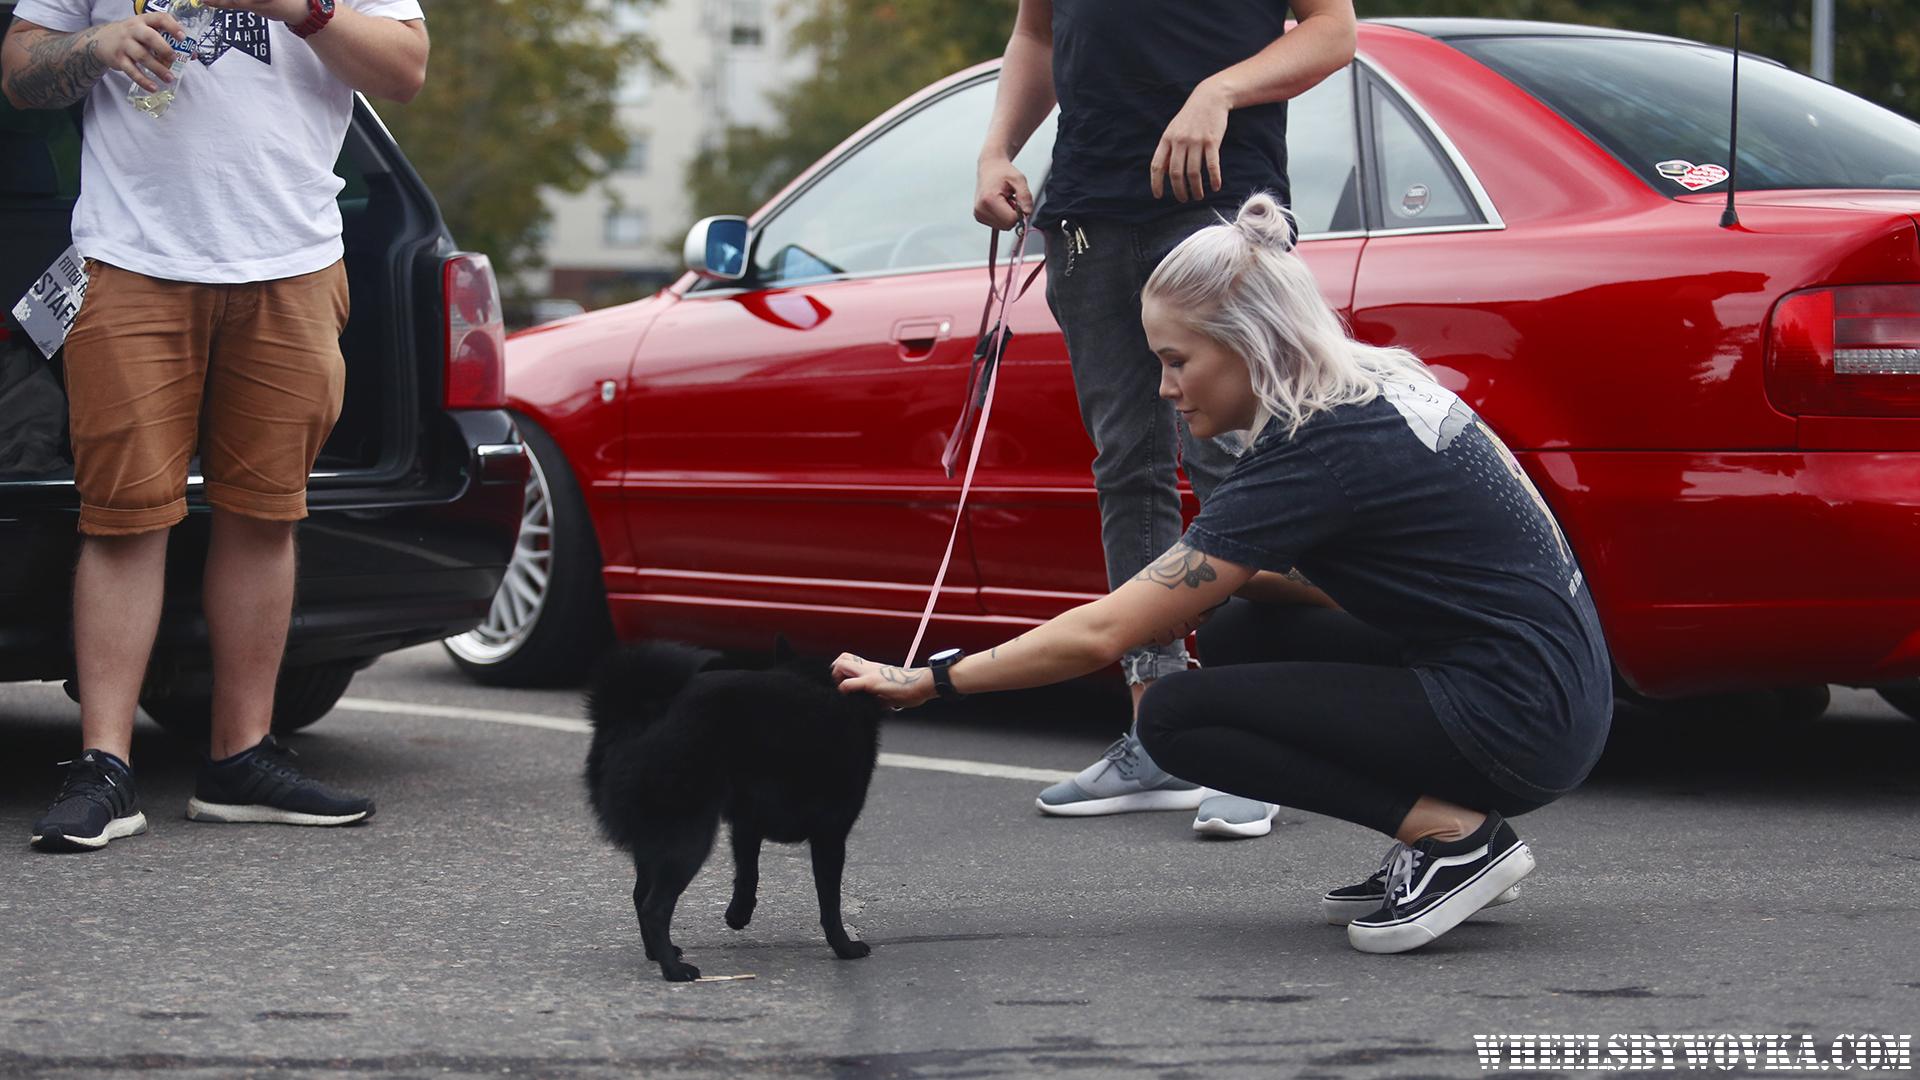 fitted-fest-lahti-finland-cdlcco-2018-by-wheelsbywovka-9